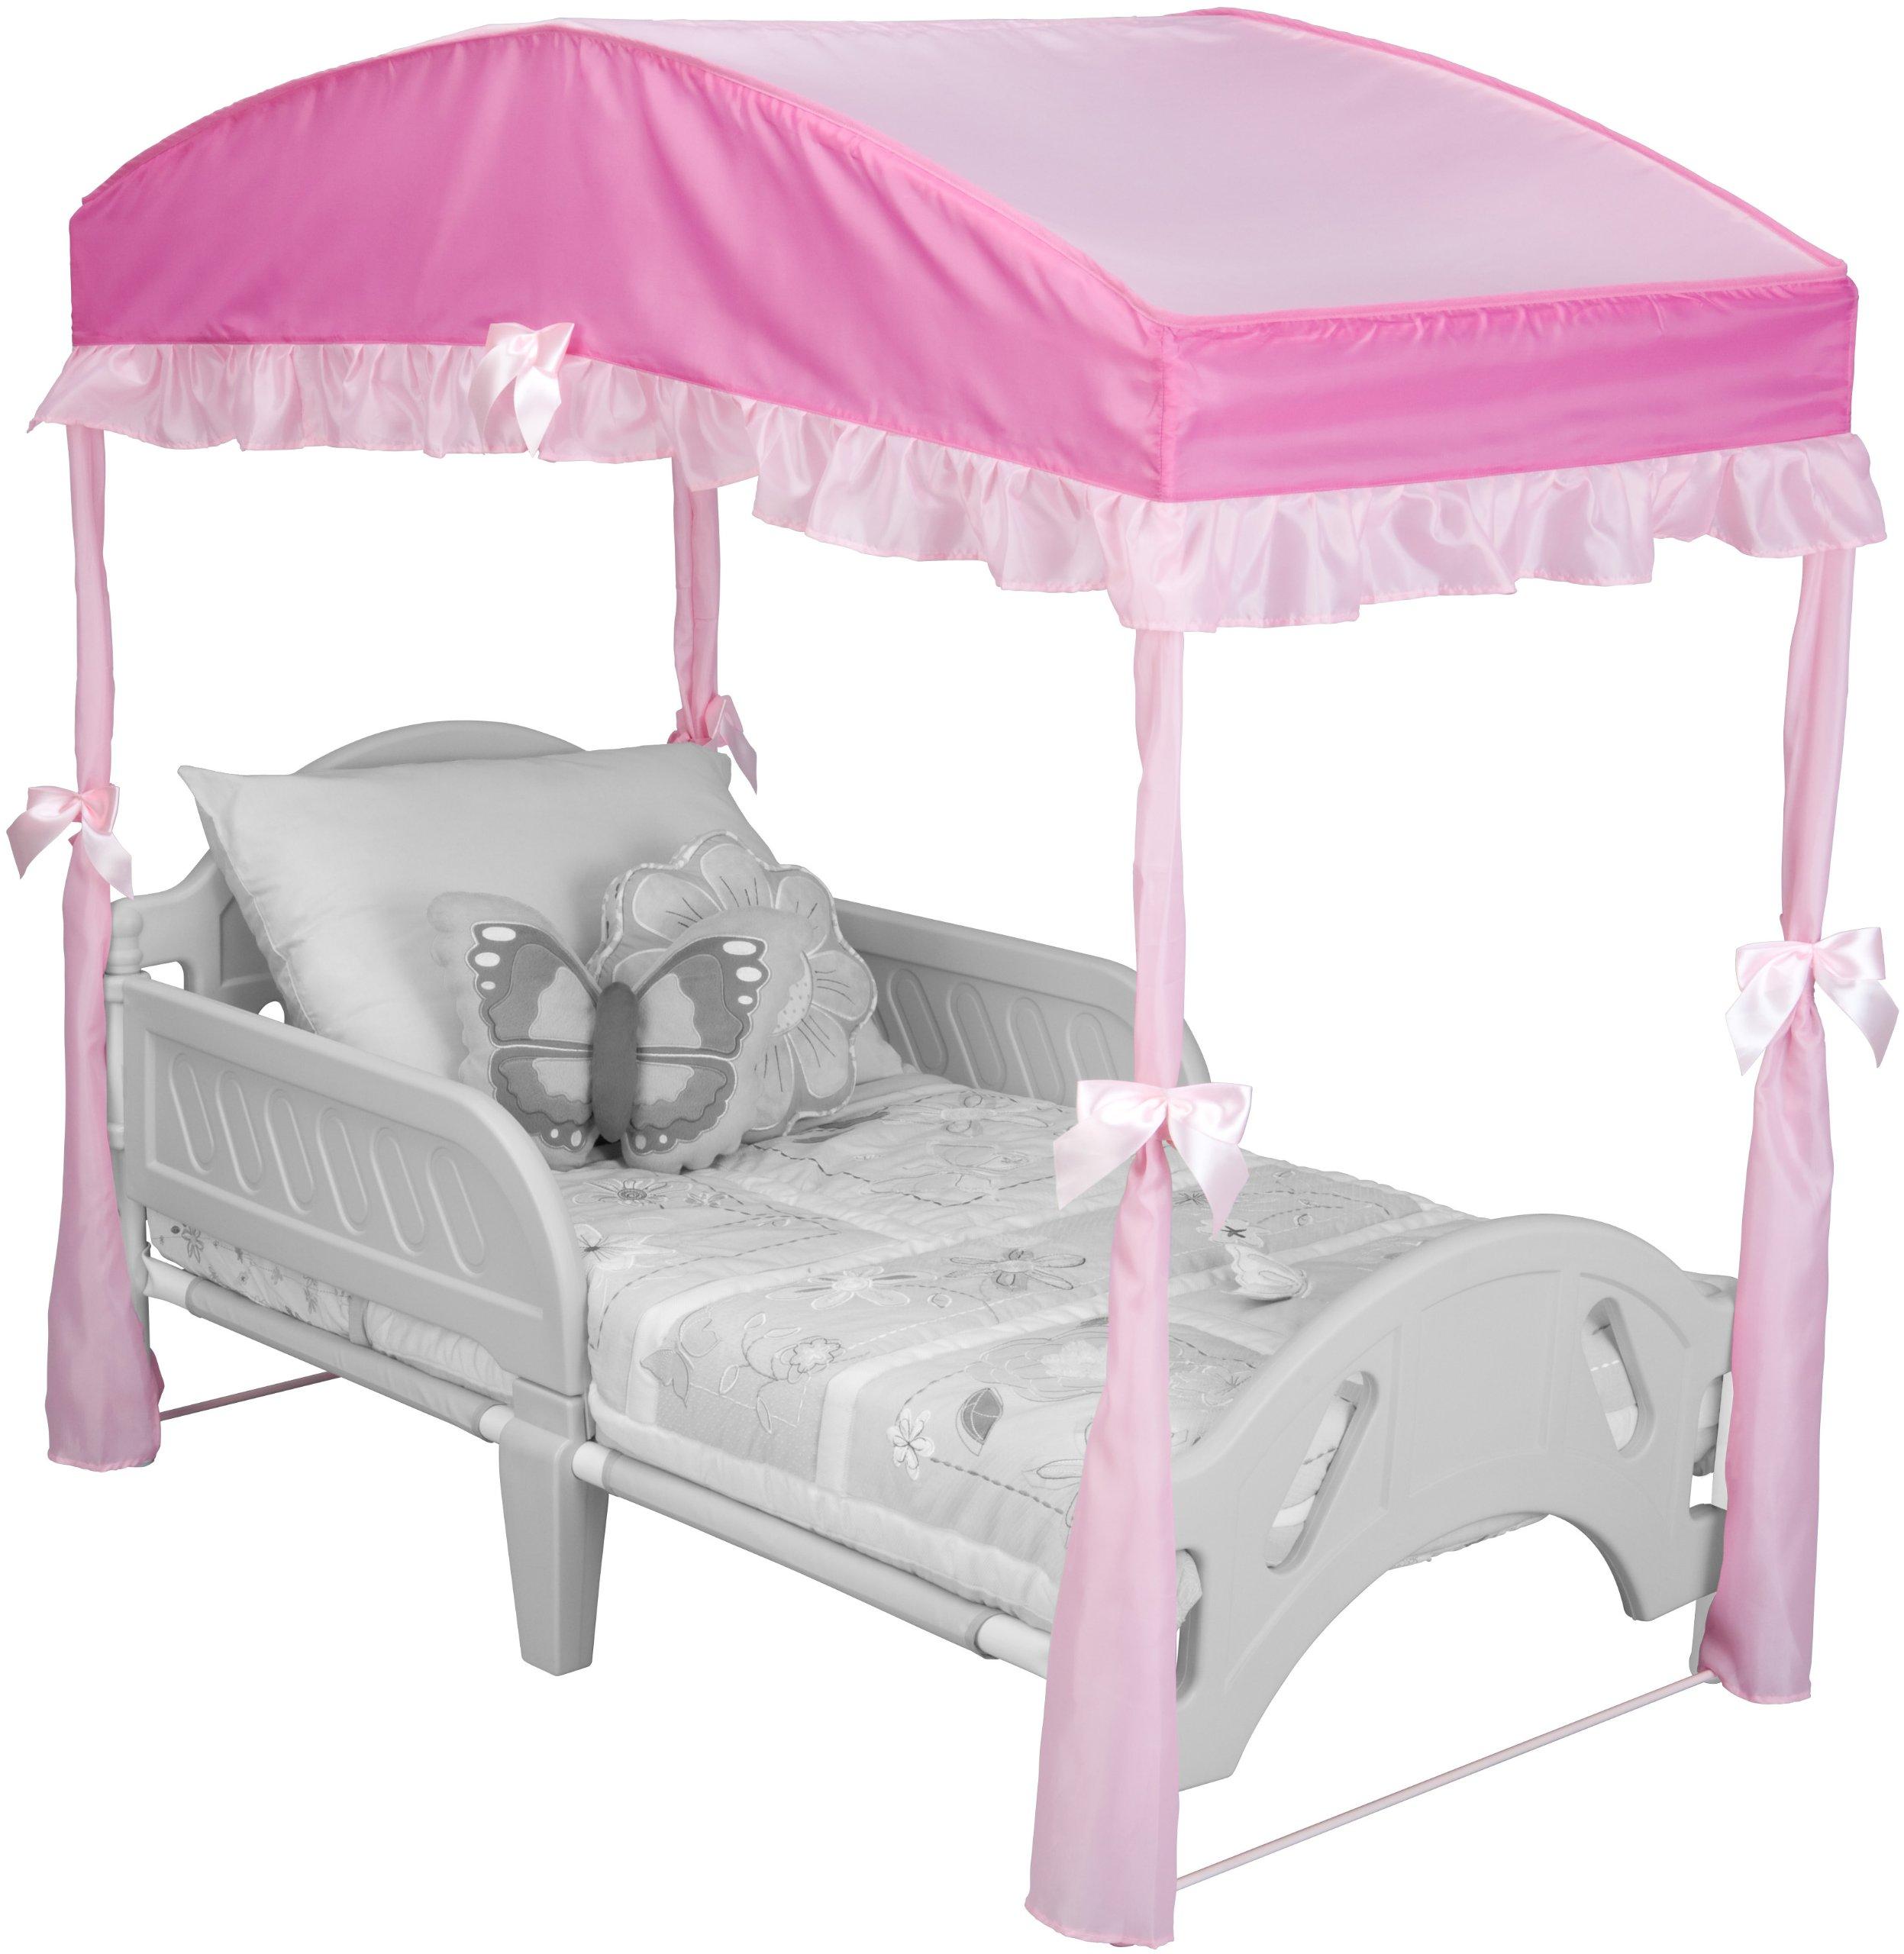 Delta Children Girls Canopy for Toddler Bed, Pink by Delta Children